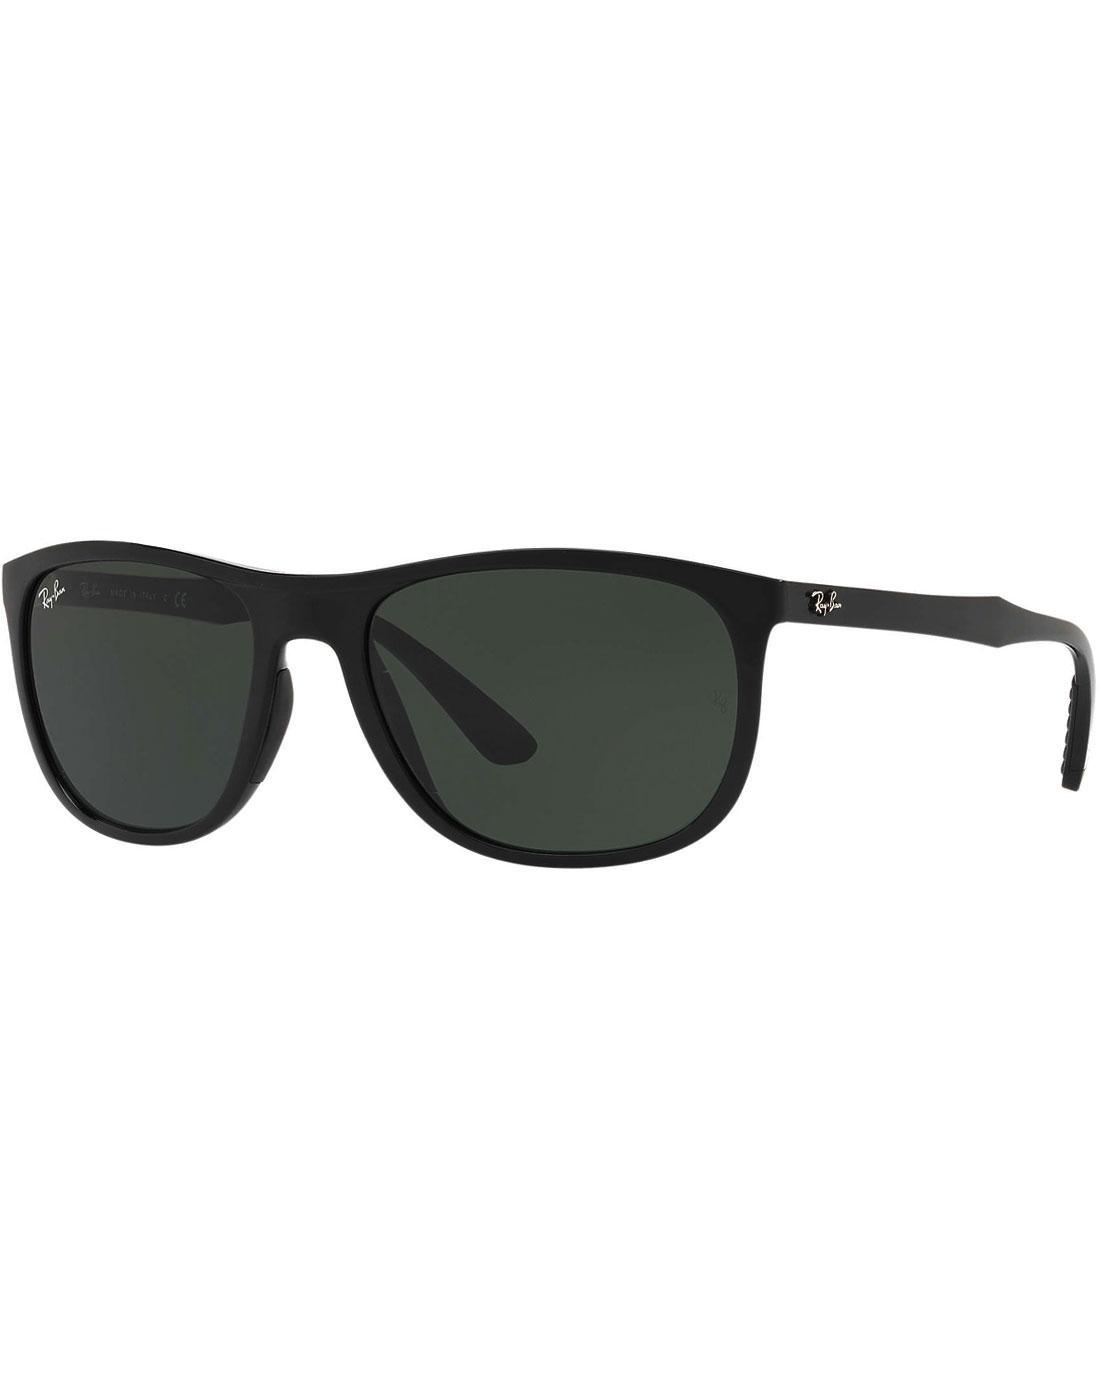 RAY-BAN Retro Wrap Around Wayfarer Sunglasses (B)